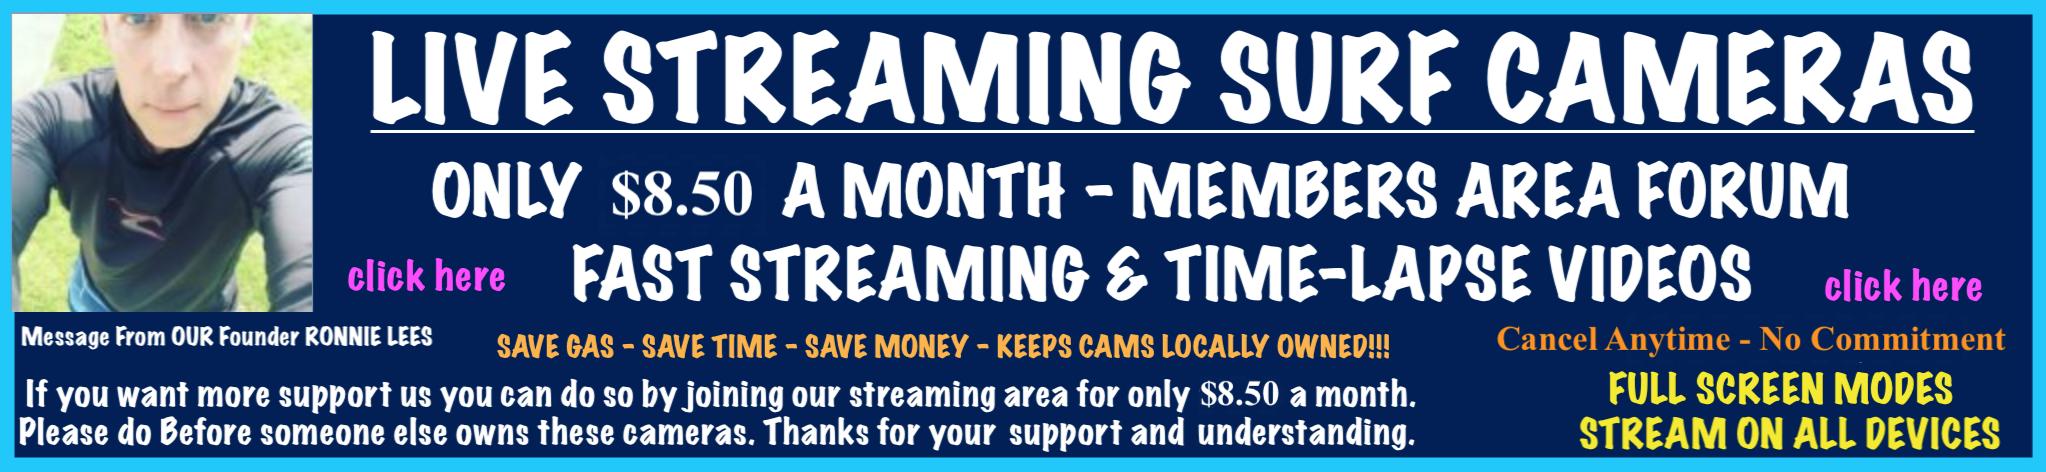 streaming-adsfinal